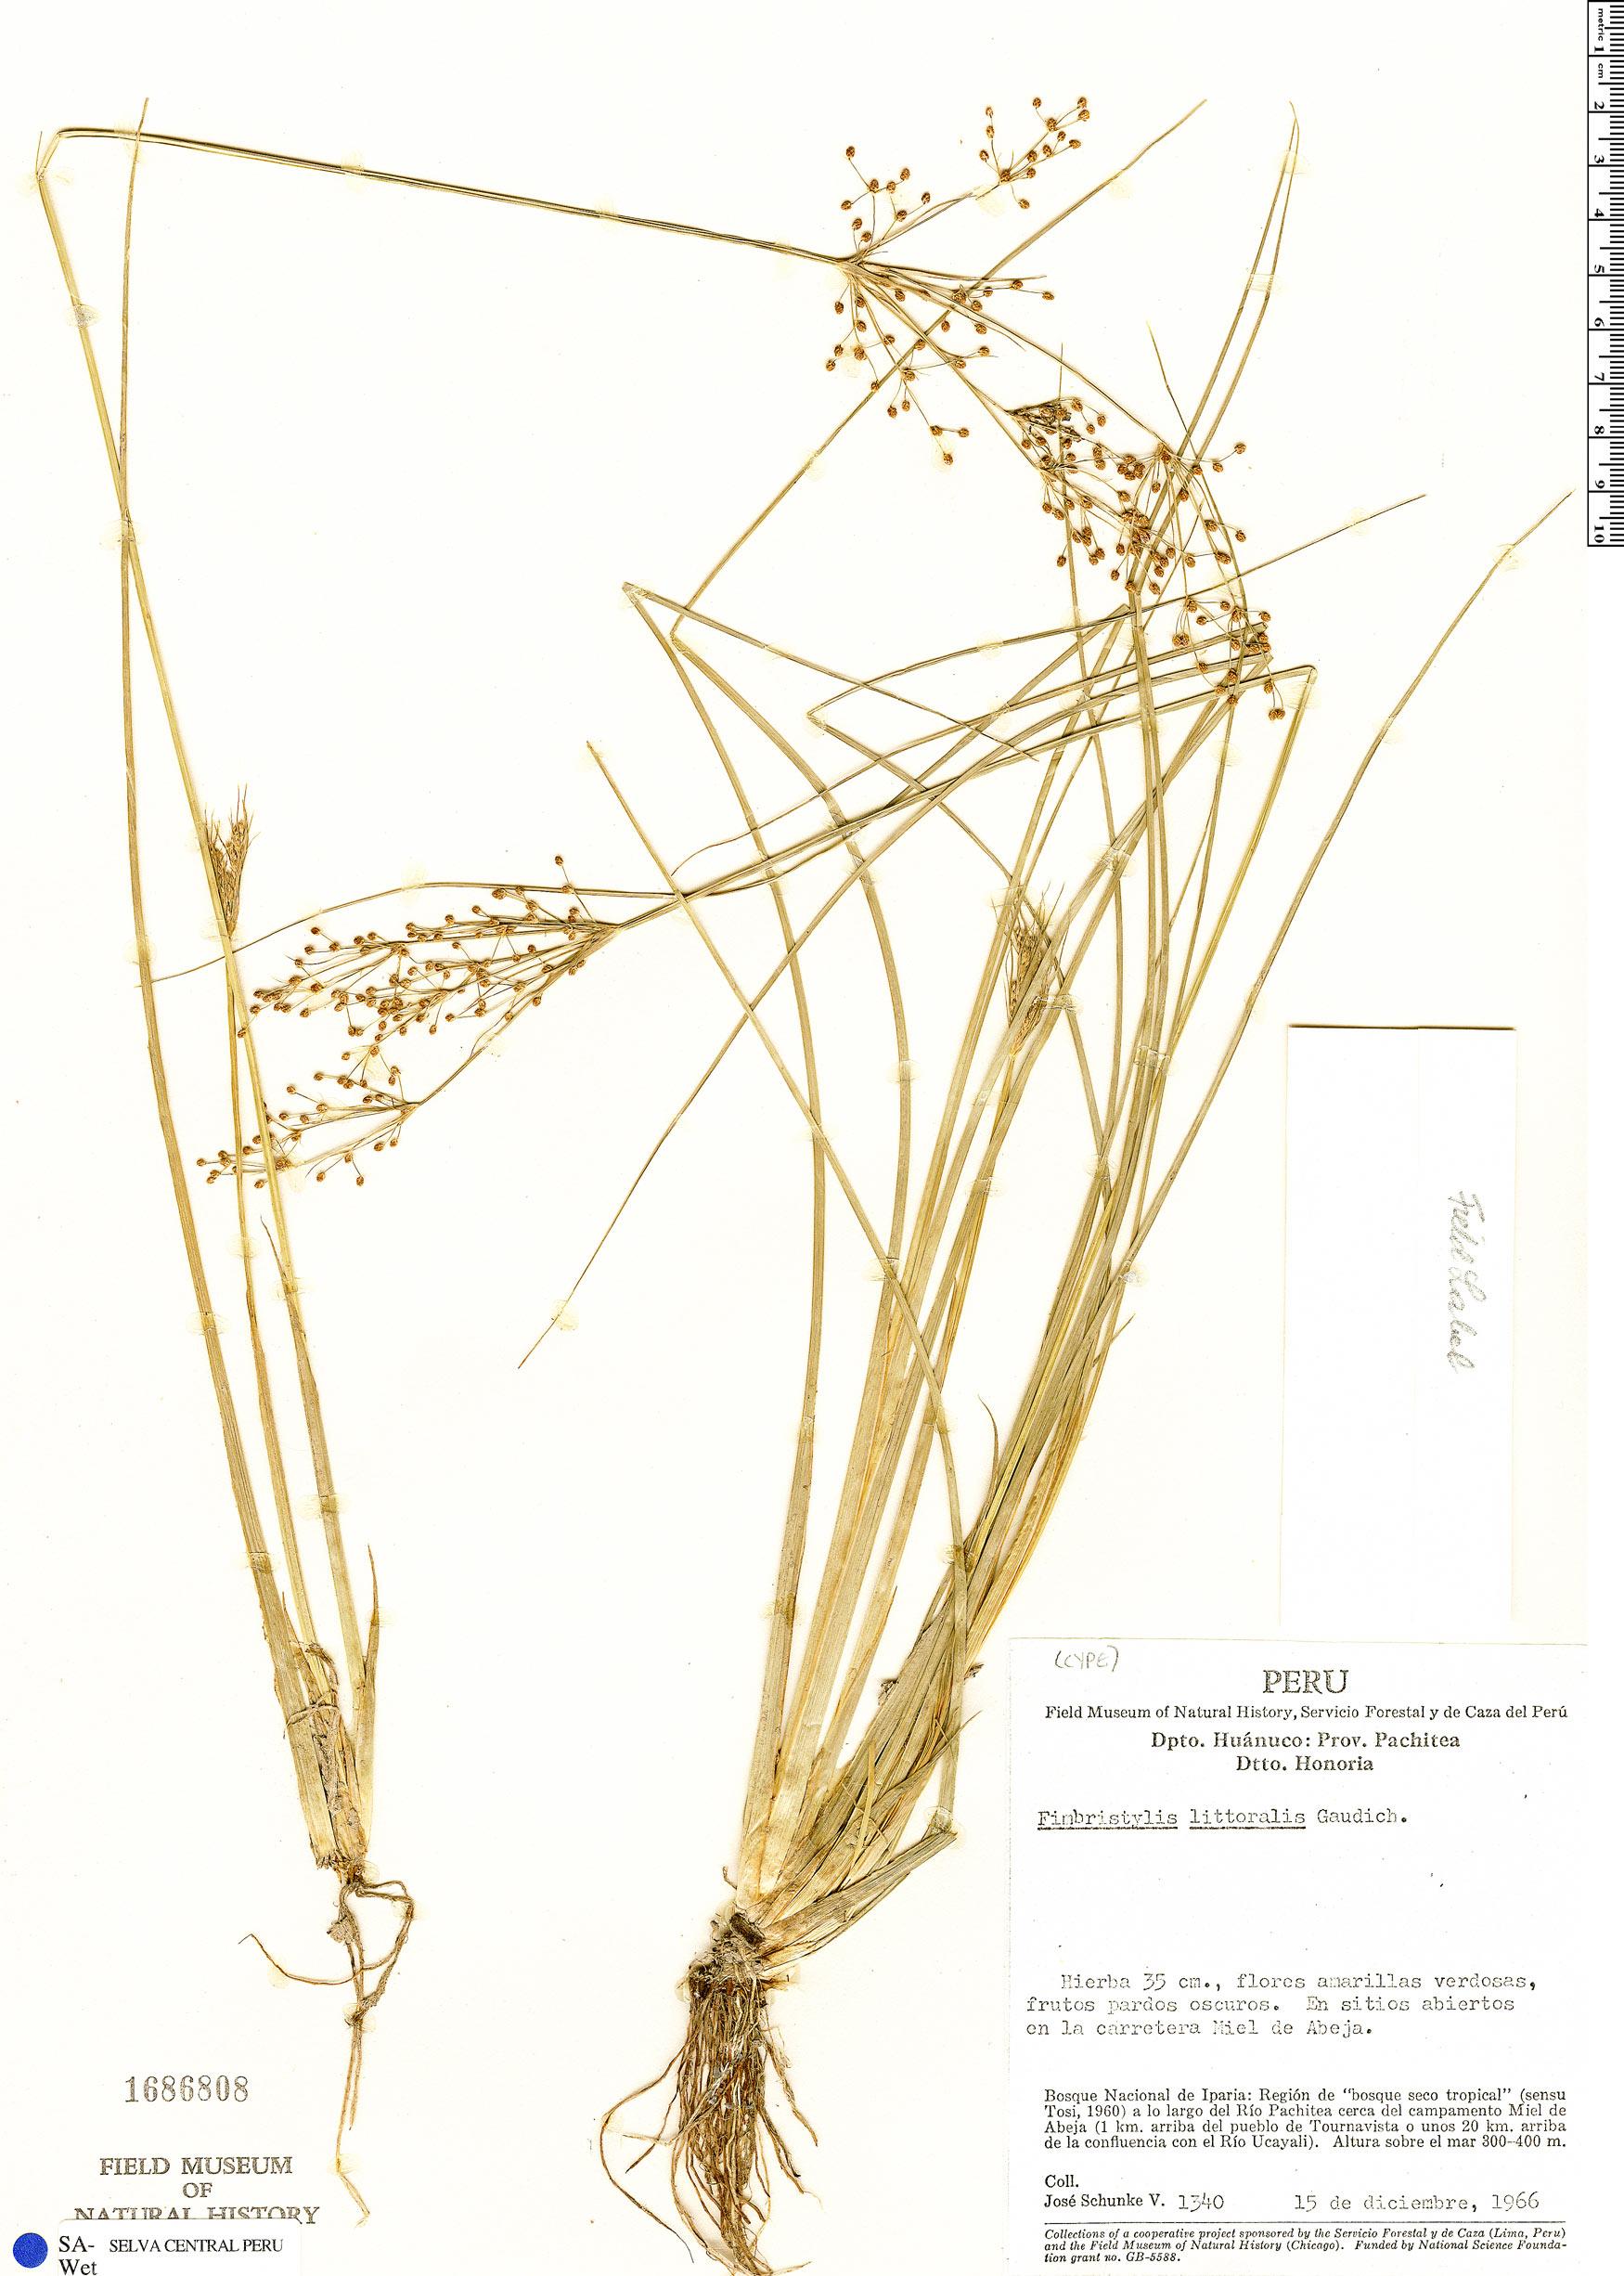 Specimen: Fimbristylis littoralis